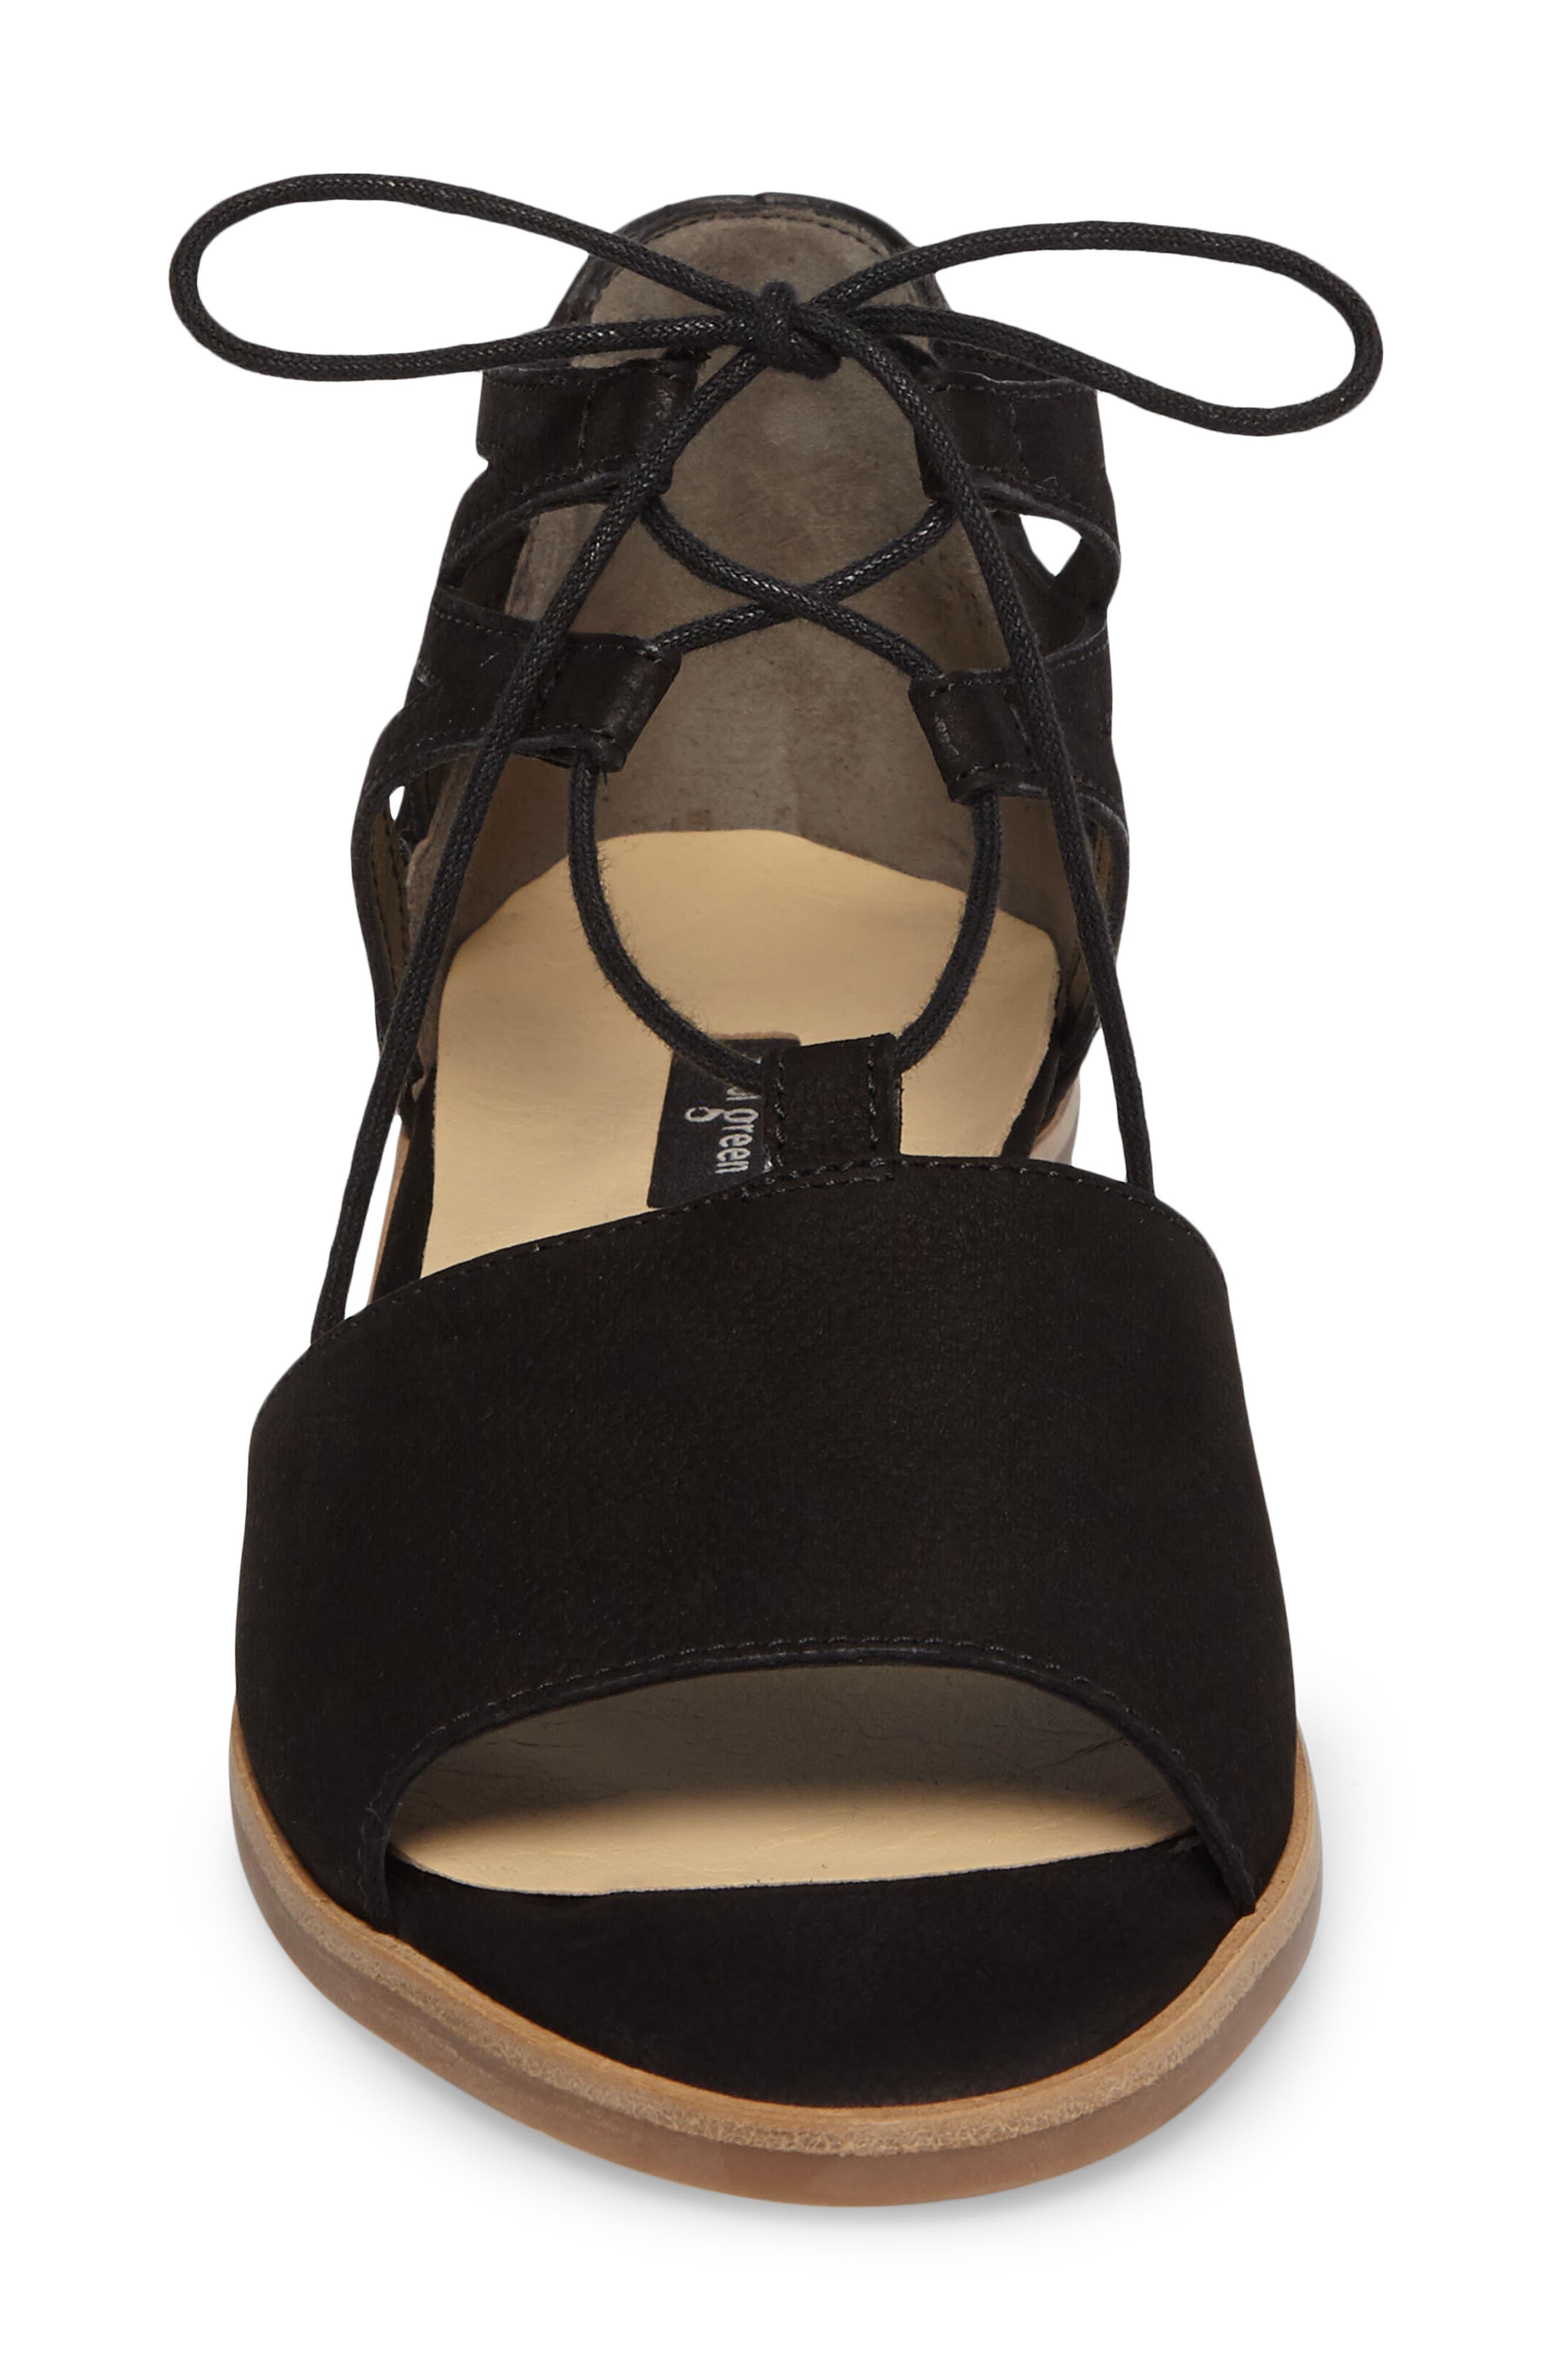 PAUL GREEN, Morea Lace-Up Sandal, Alternate thumbnail 4, color, BLACK LEATHER